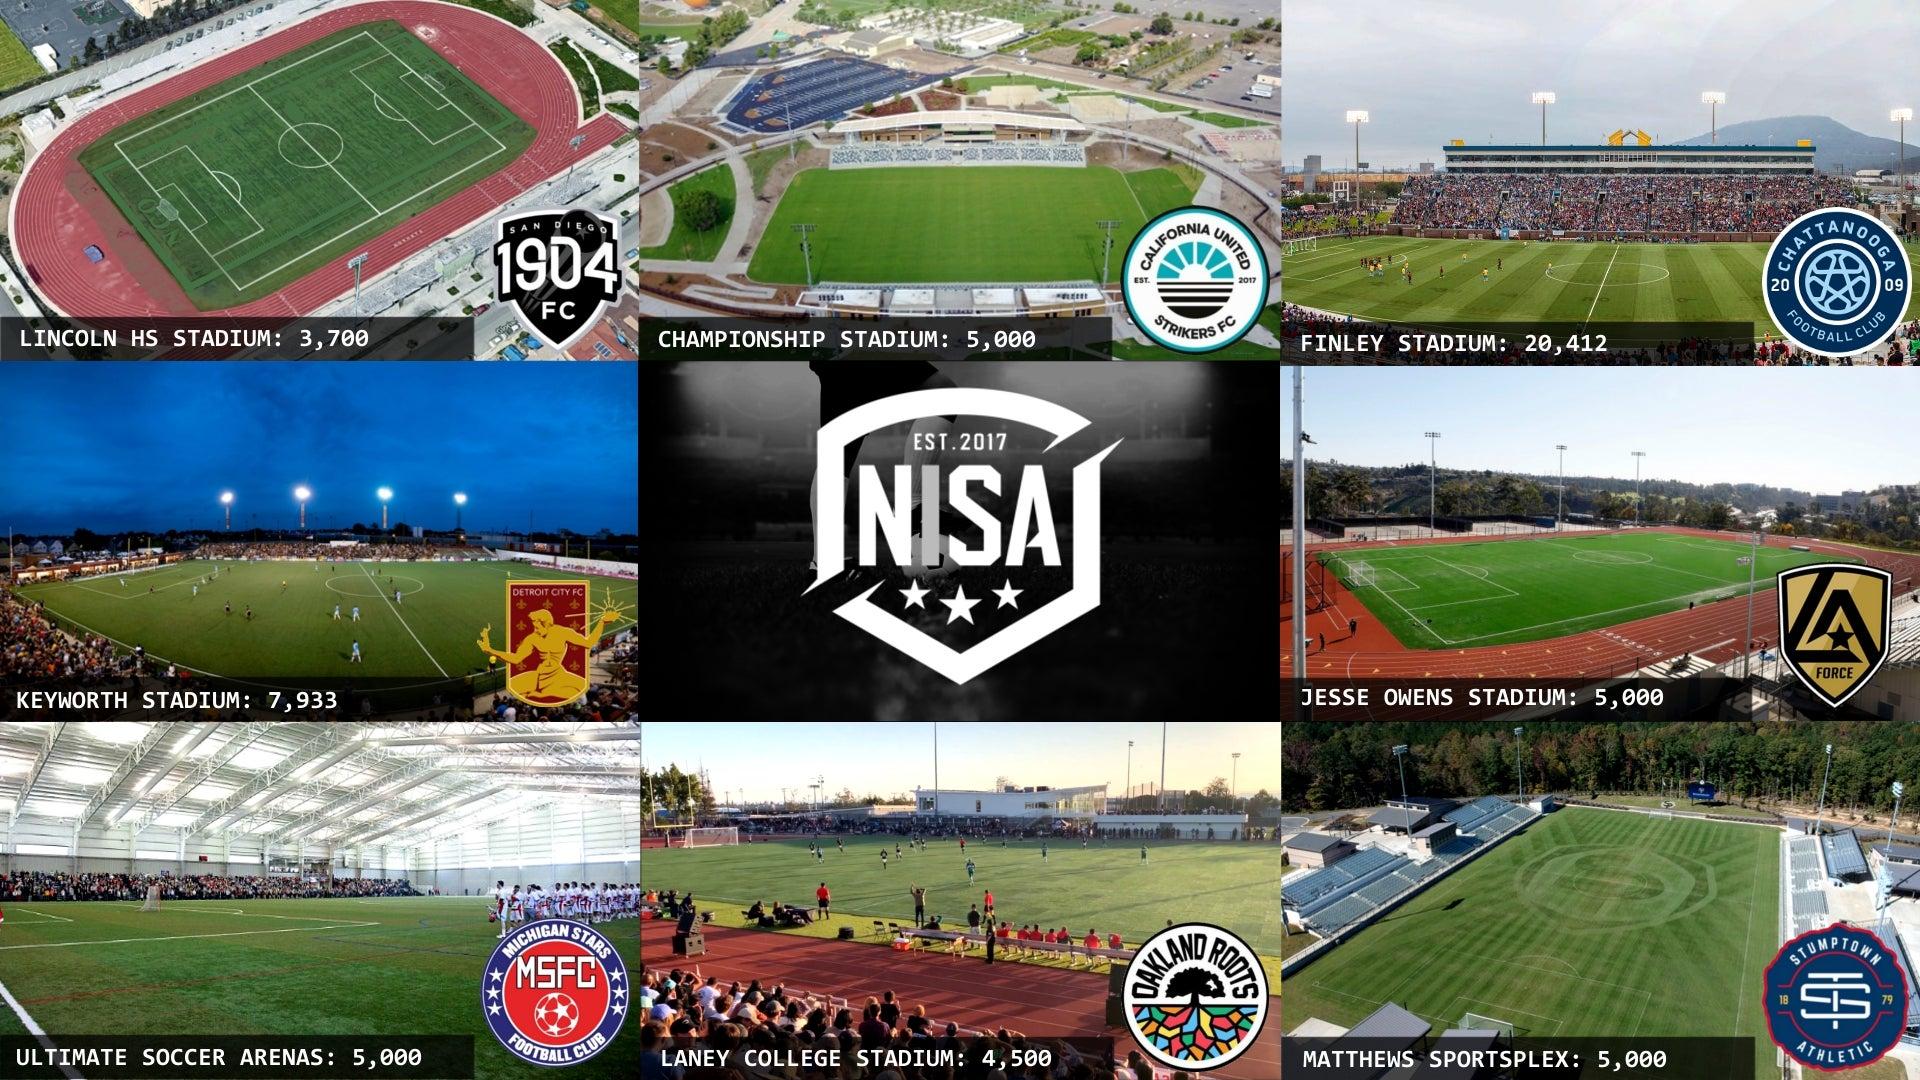 NISA Stadium